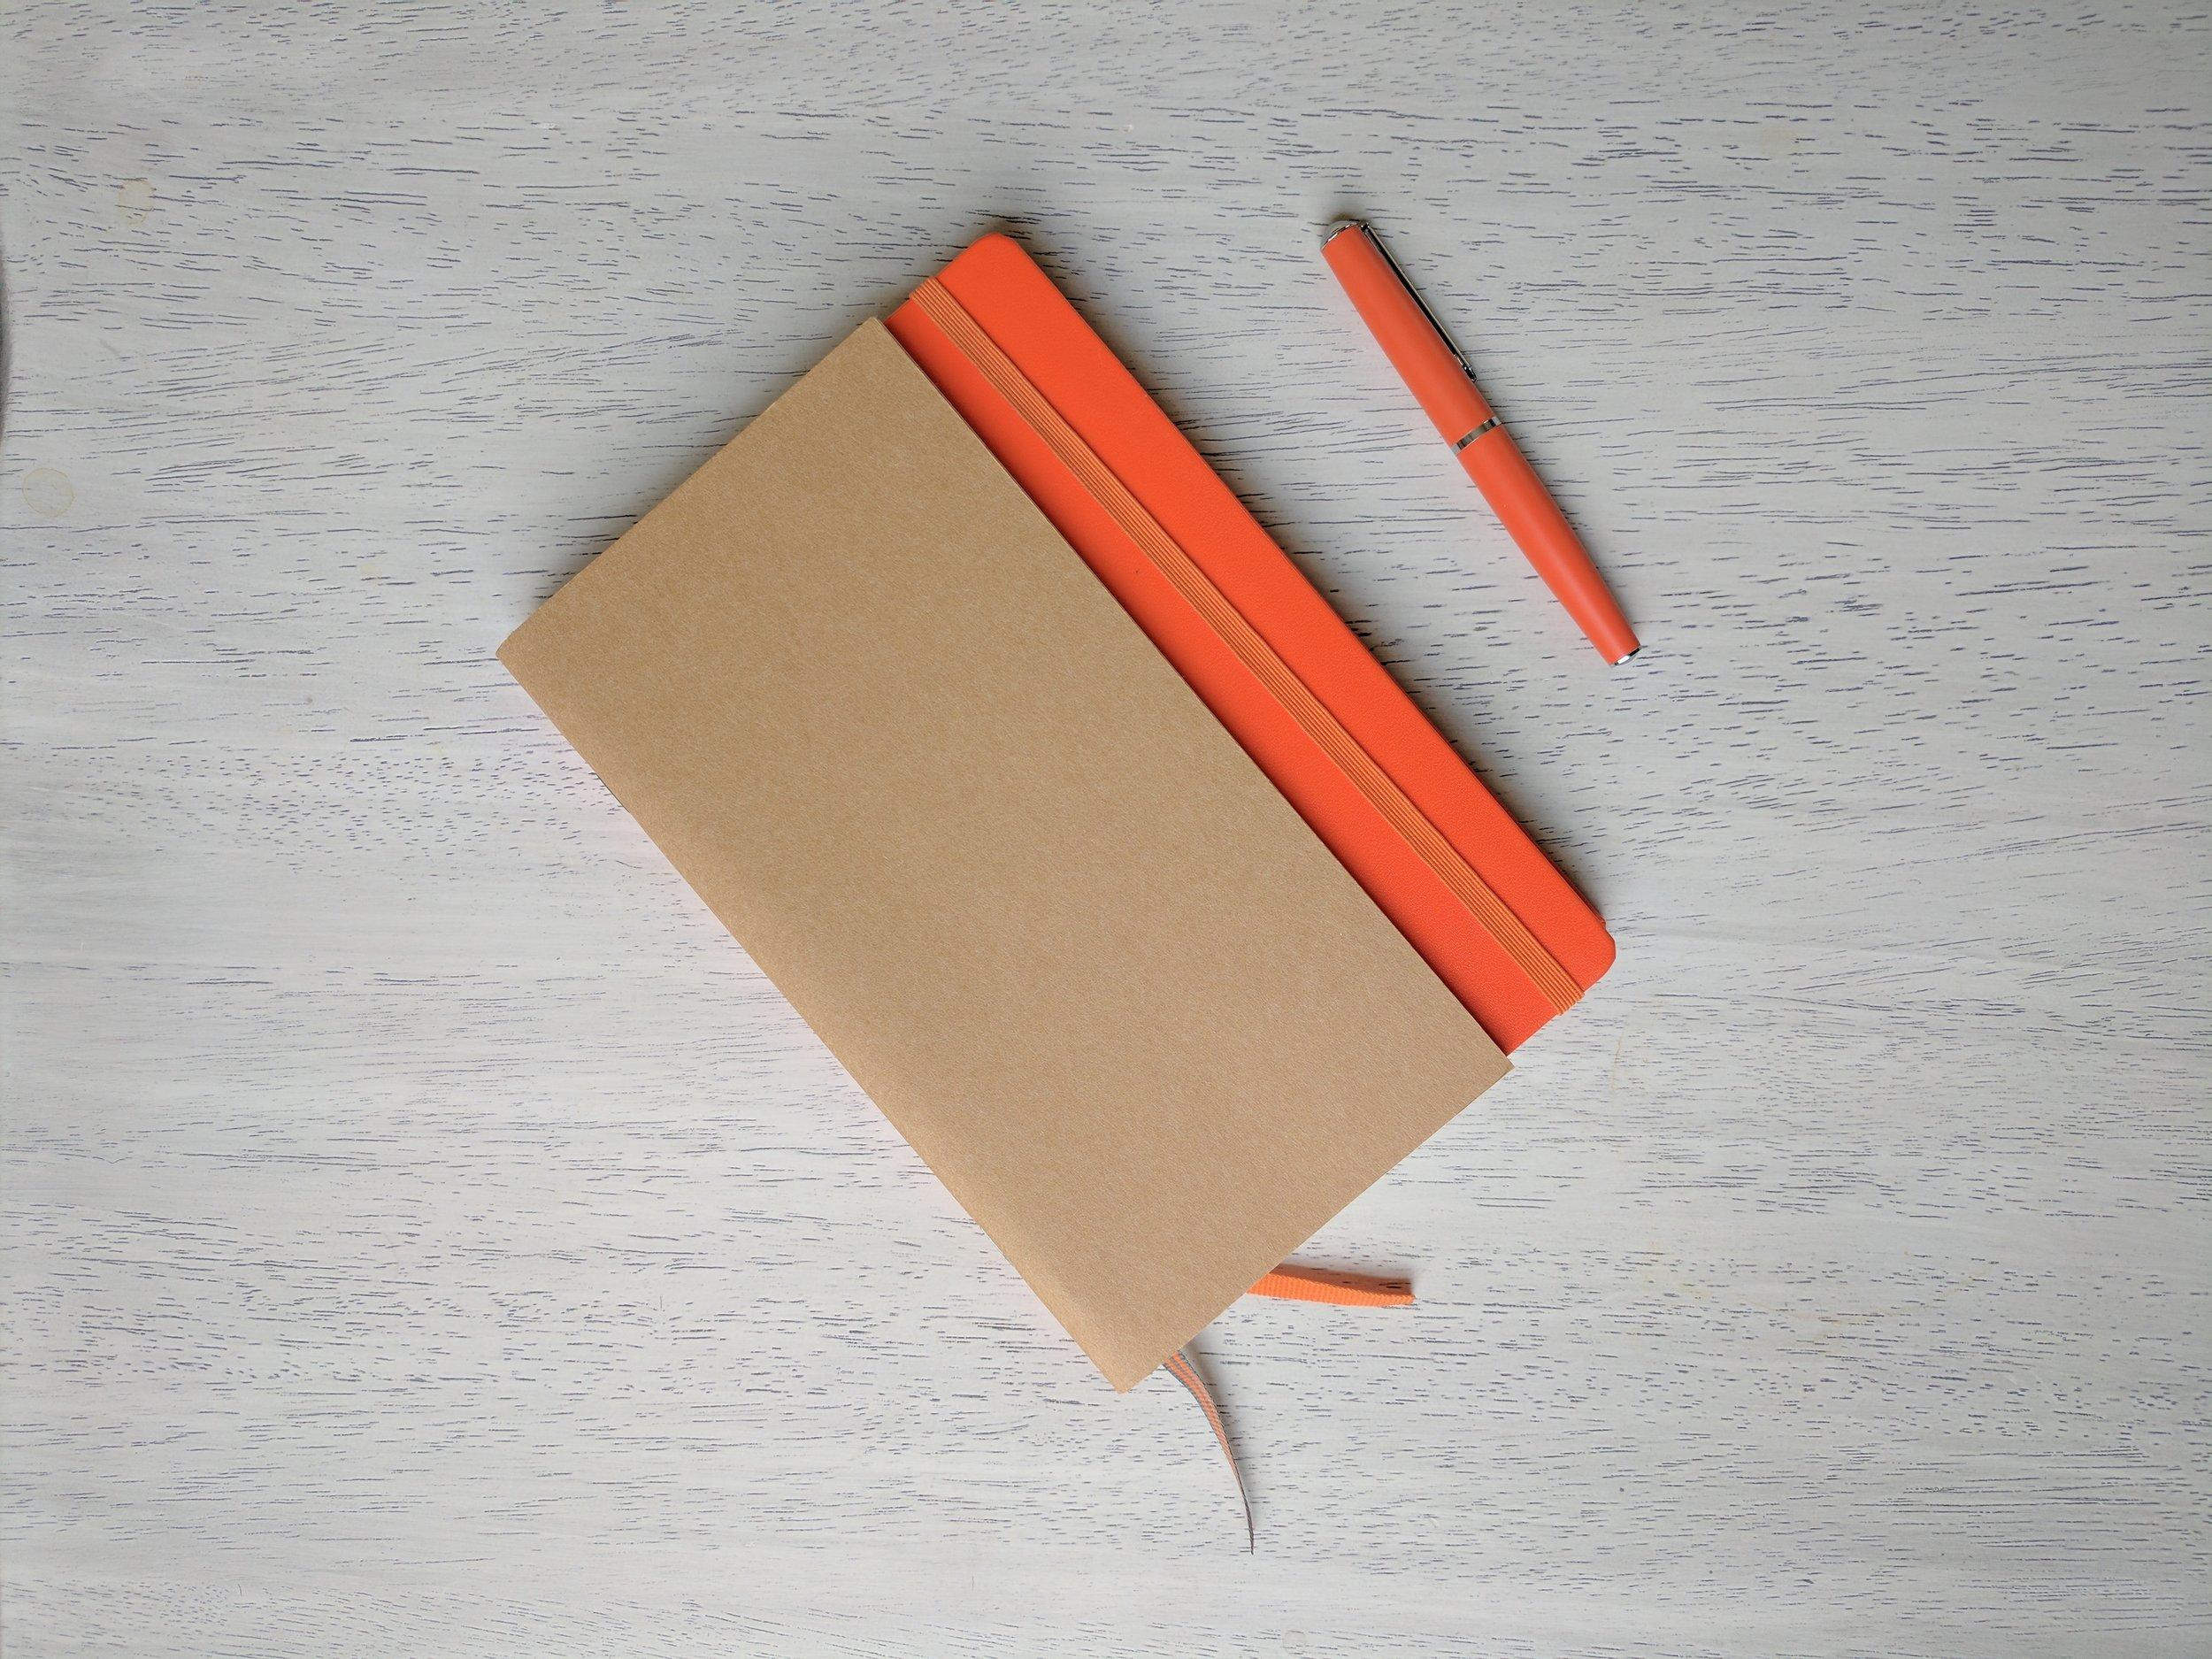 Midori Travelers Notebook Review Leuchtterm1917 Comparison 1.jpg